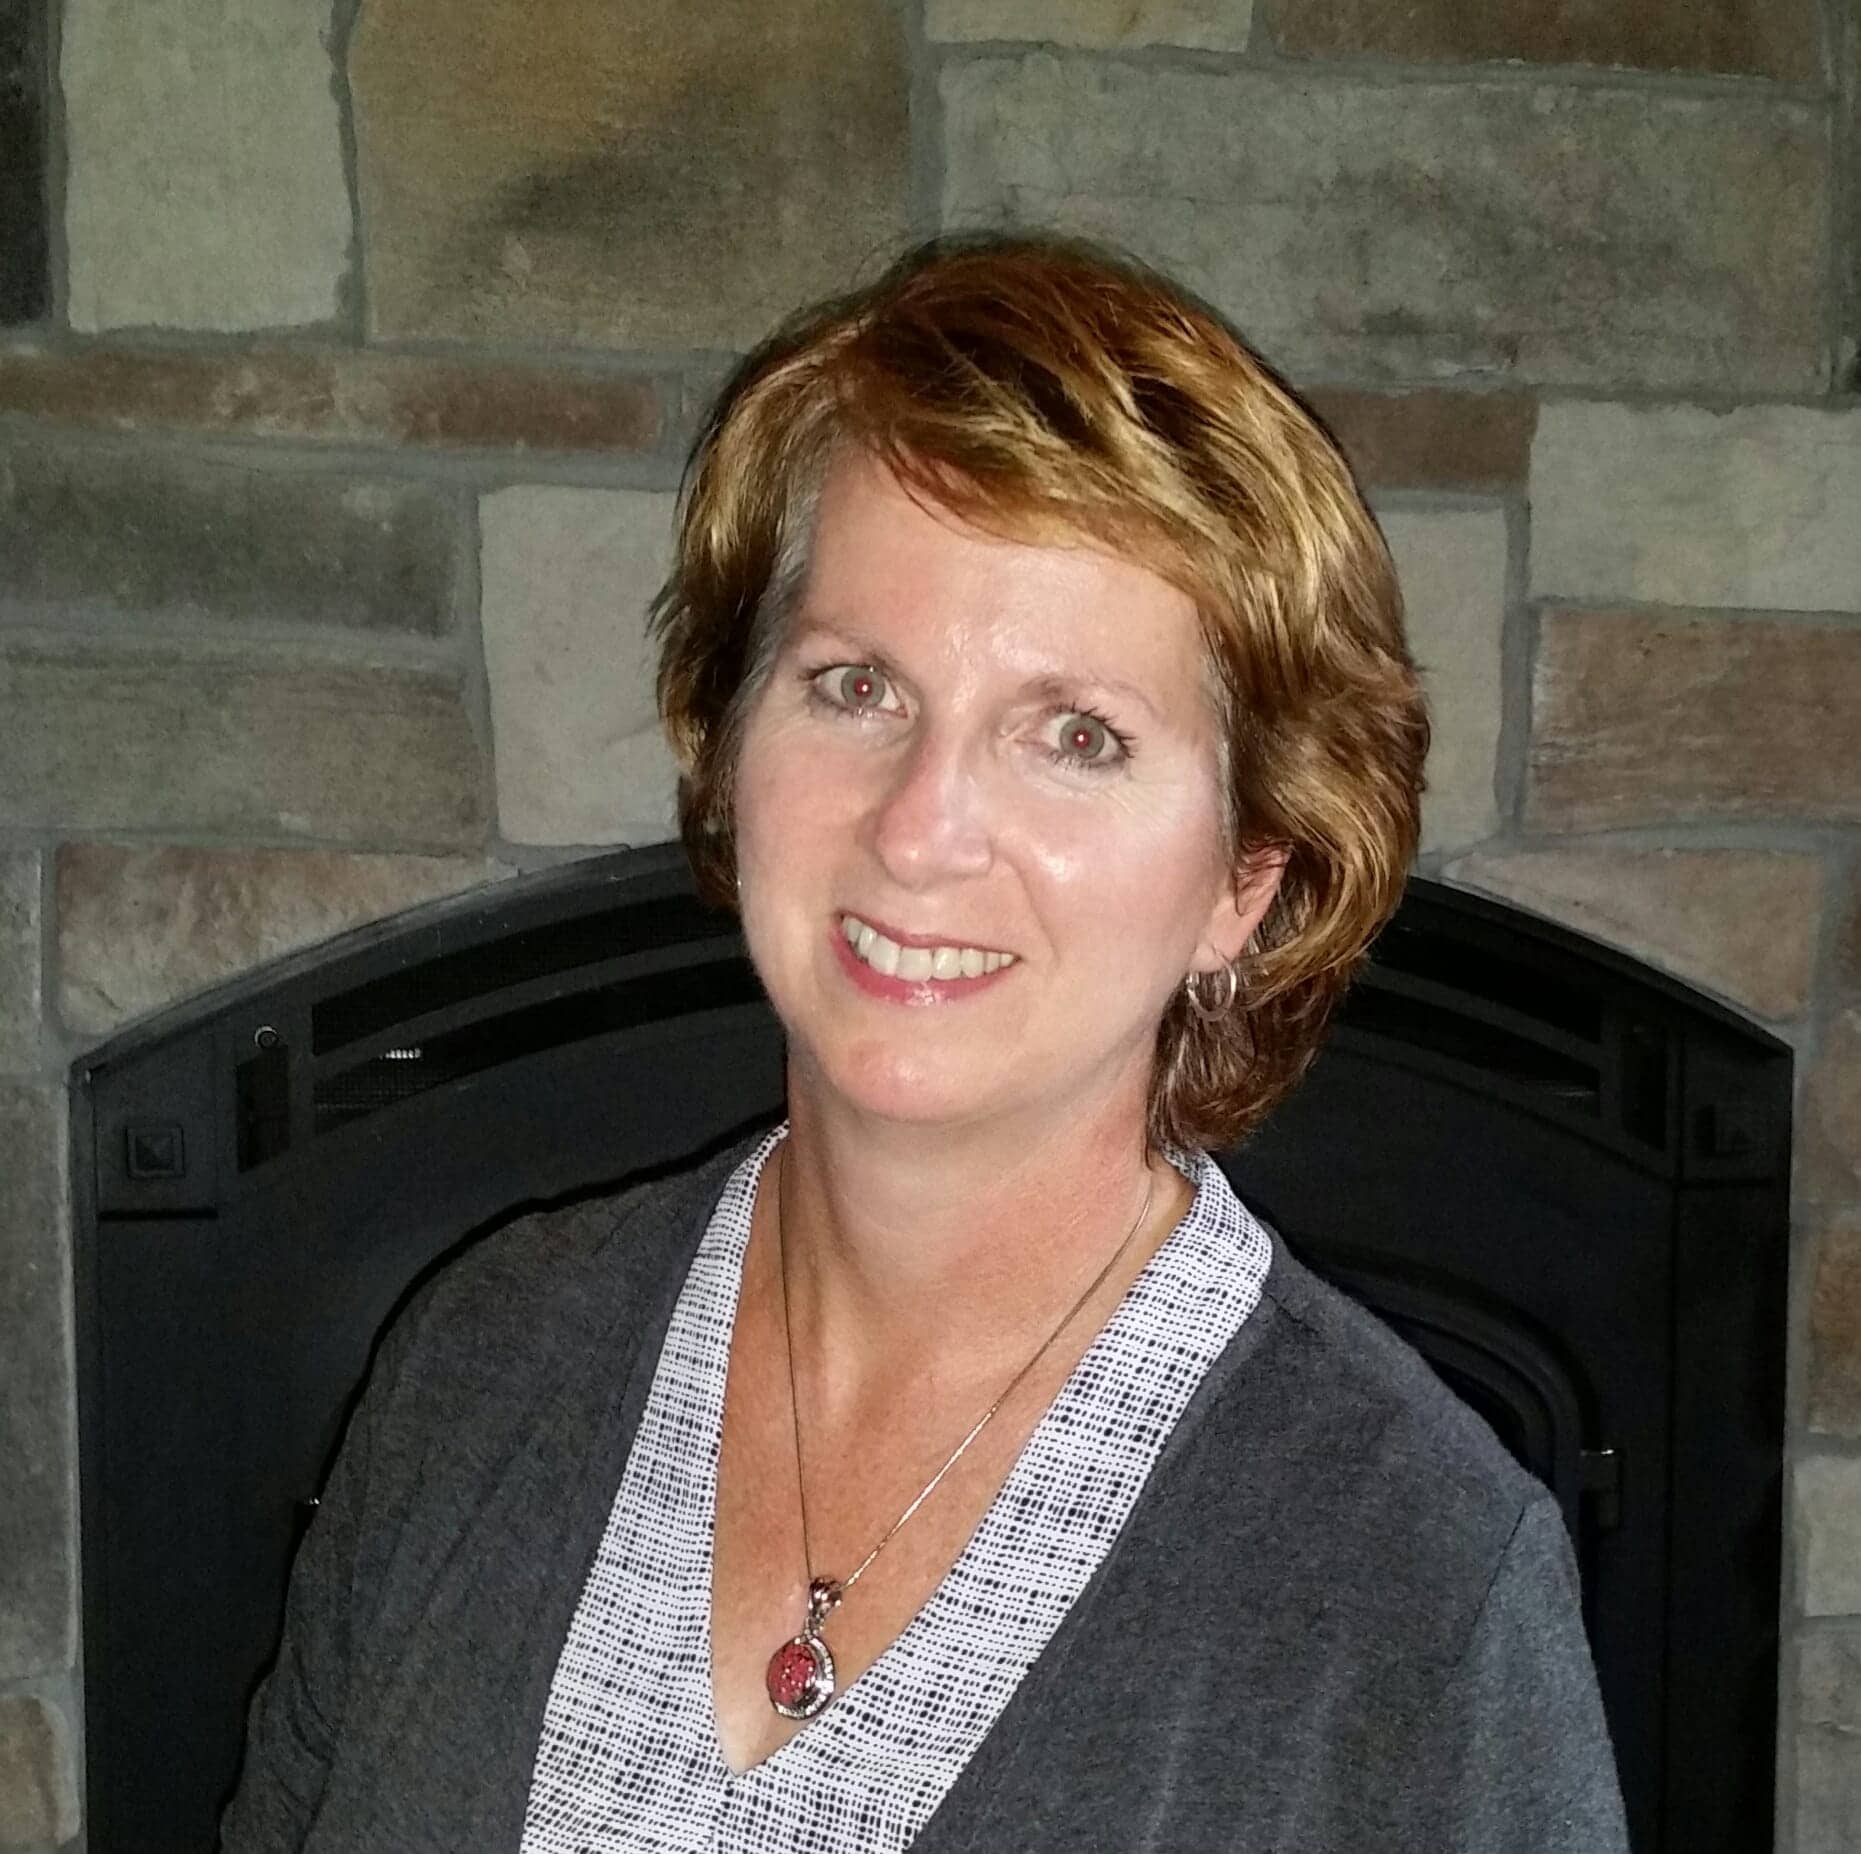 Julie Rudolph